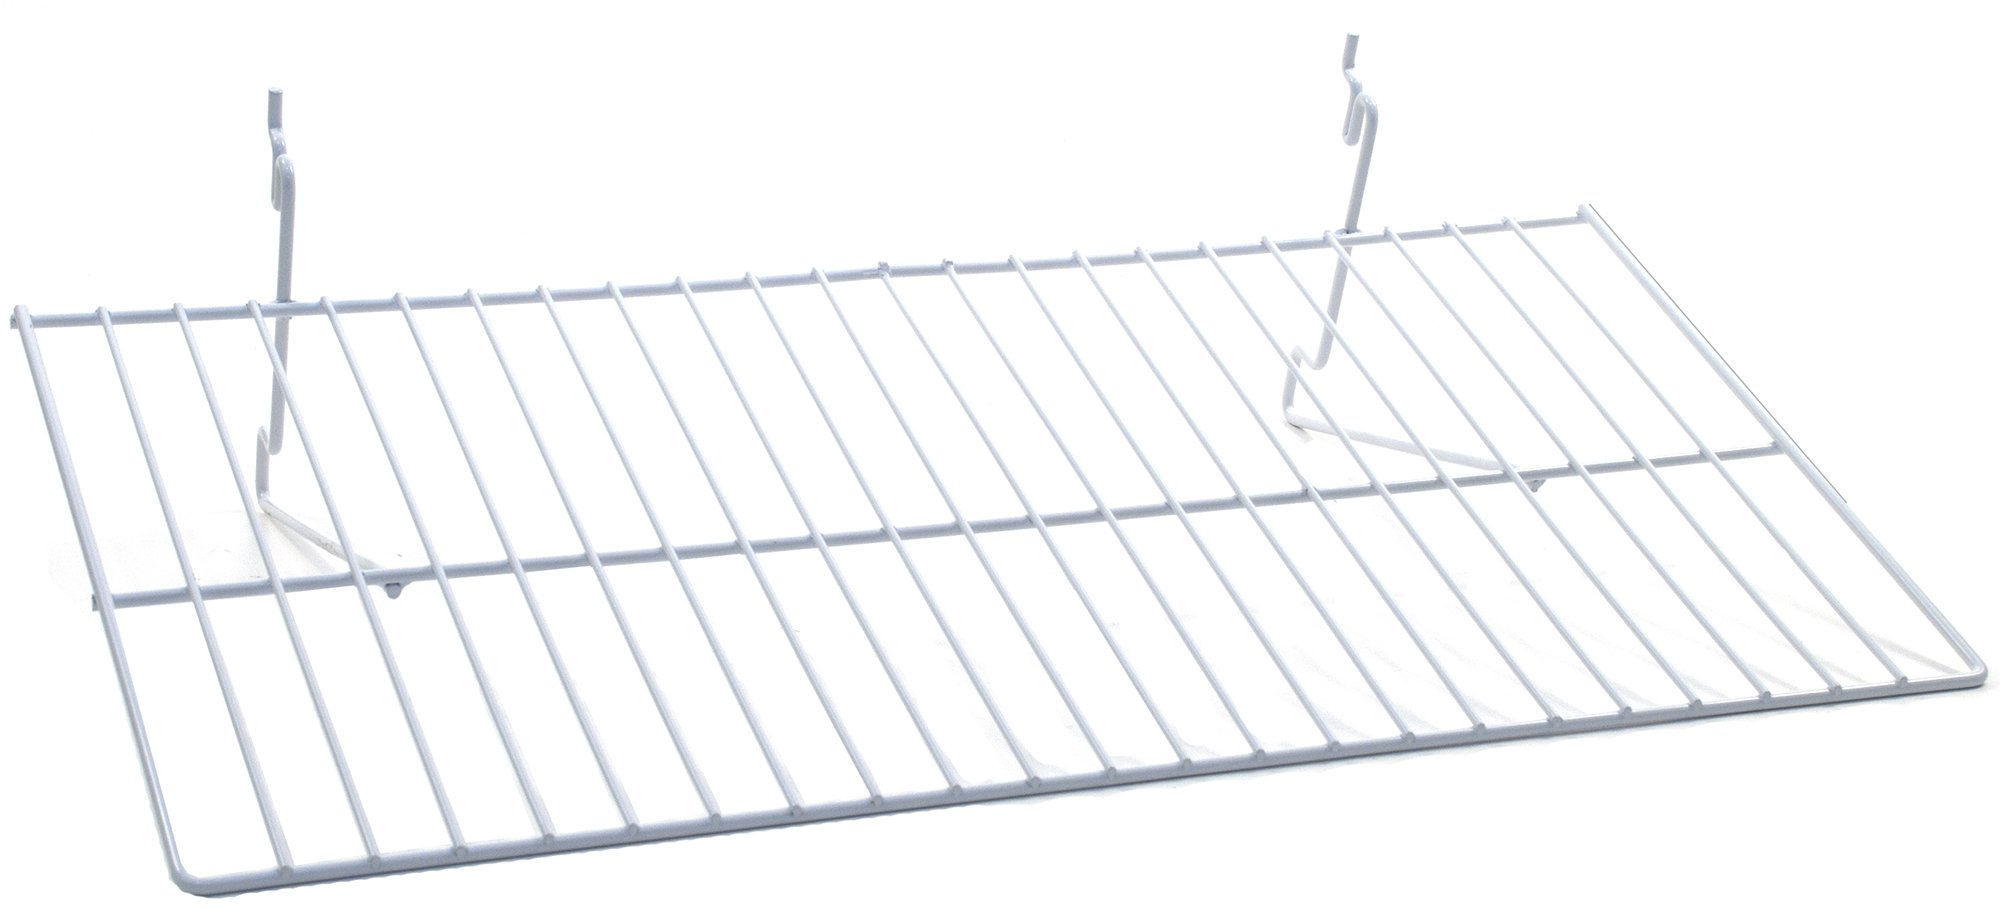 KC Store Fixtures A03067 Flat Shelf Fits Slatwall, Grid, Pegboard, 23-1/2'' W x 12'' D, White (Pack of 10)